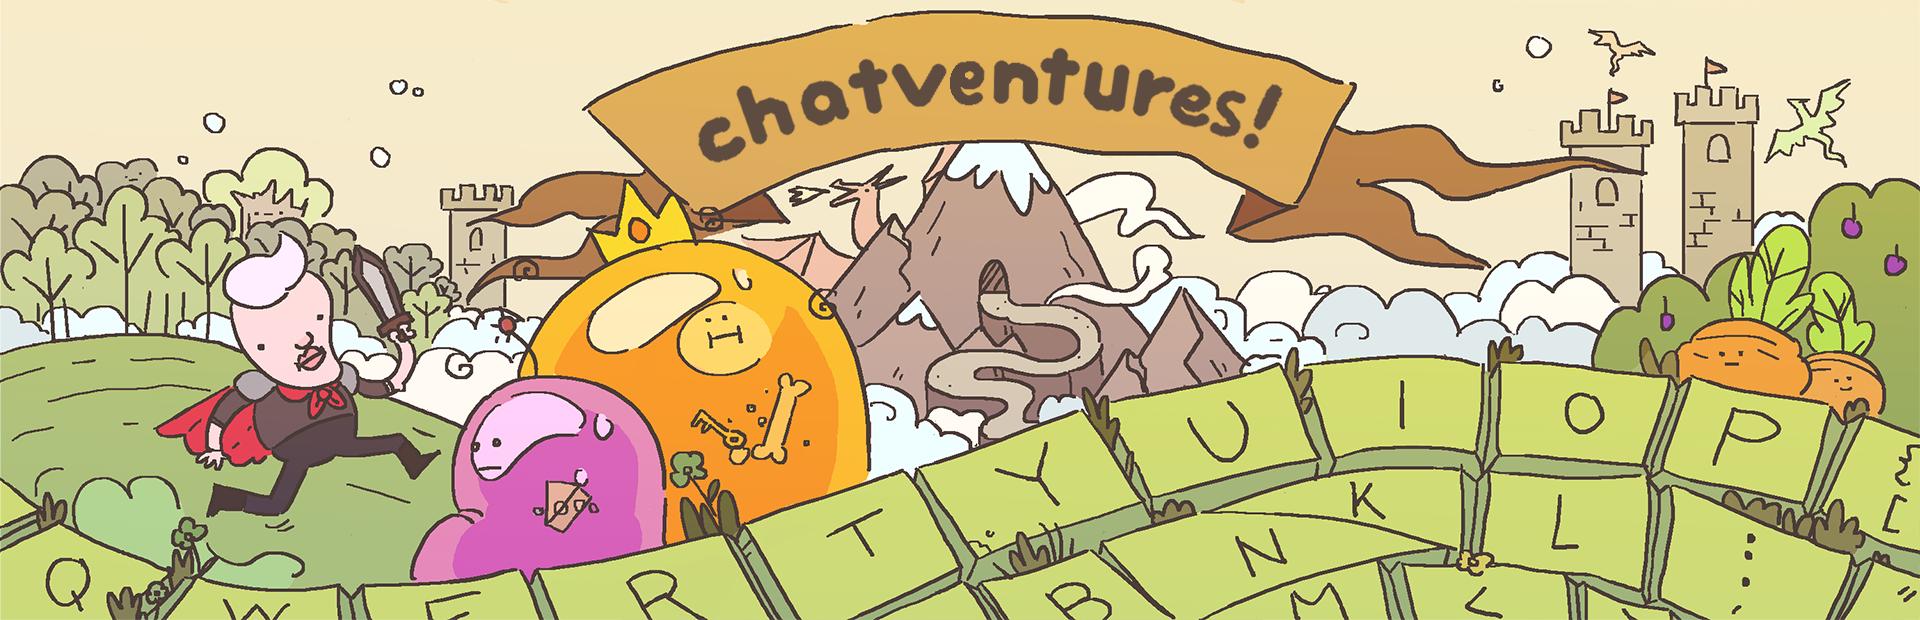 Chatventures